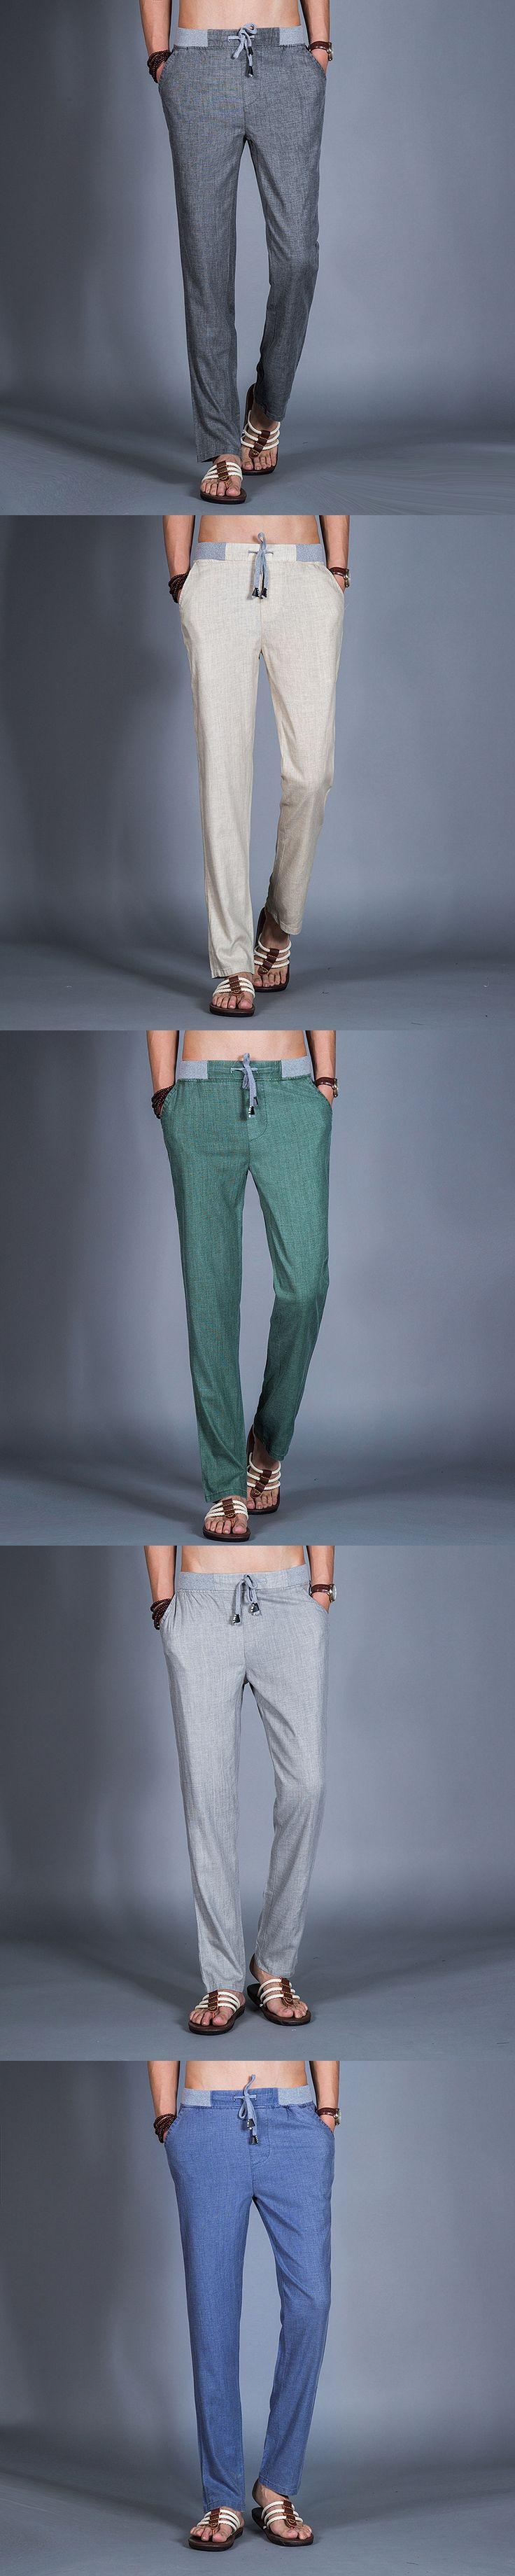 Uwback 2017 New Brand Autumn Linen Pants Men Plus Size 3XL Loose Casual Pants Summer Lightweight Pants Long Trousers Men CAA171